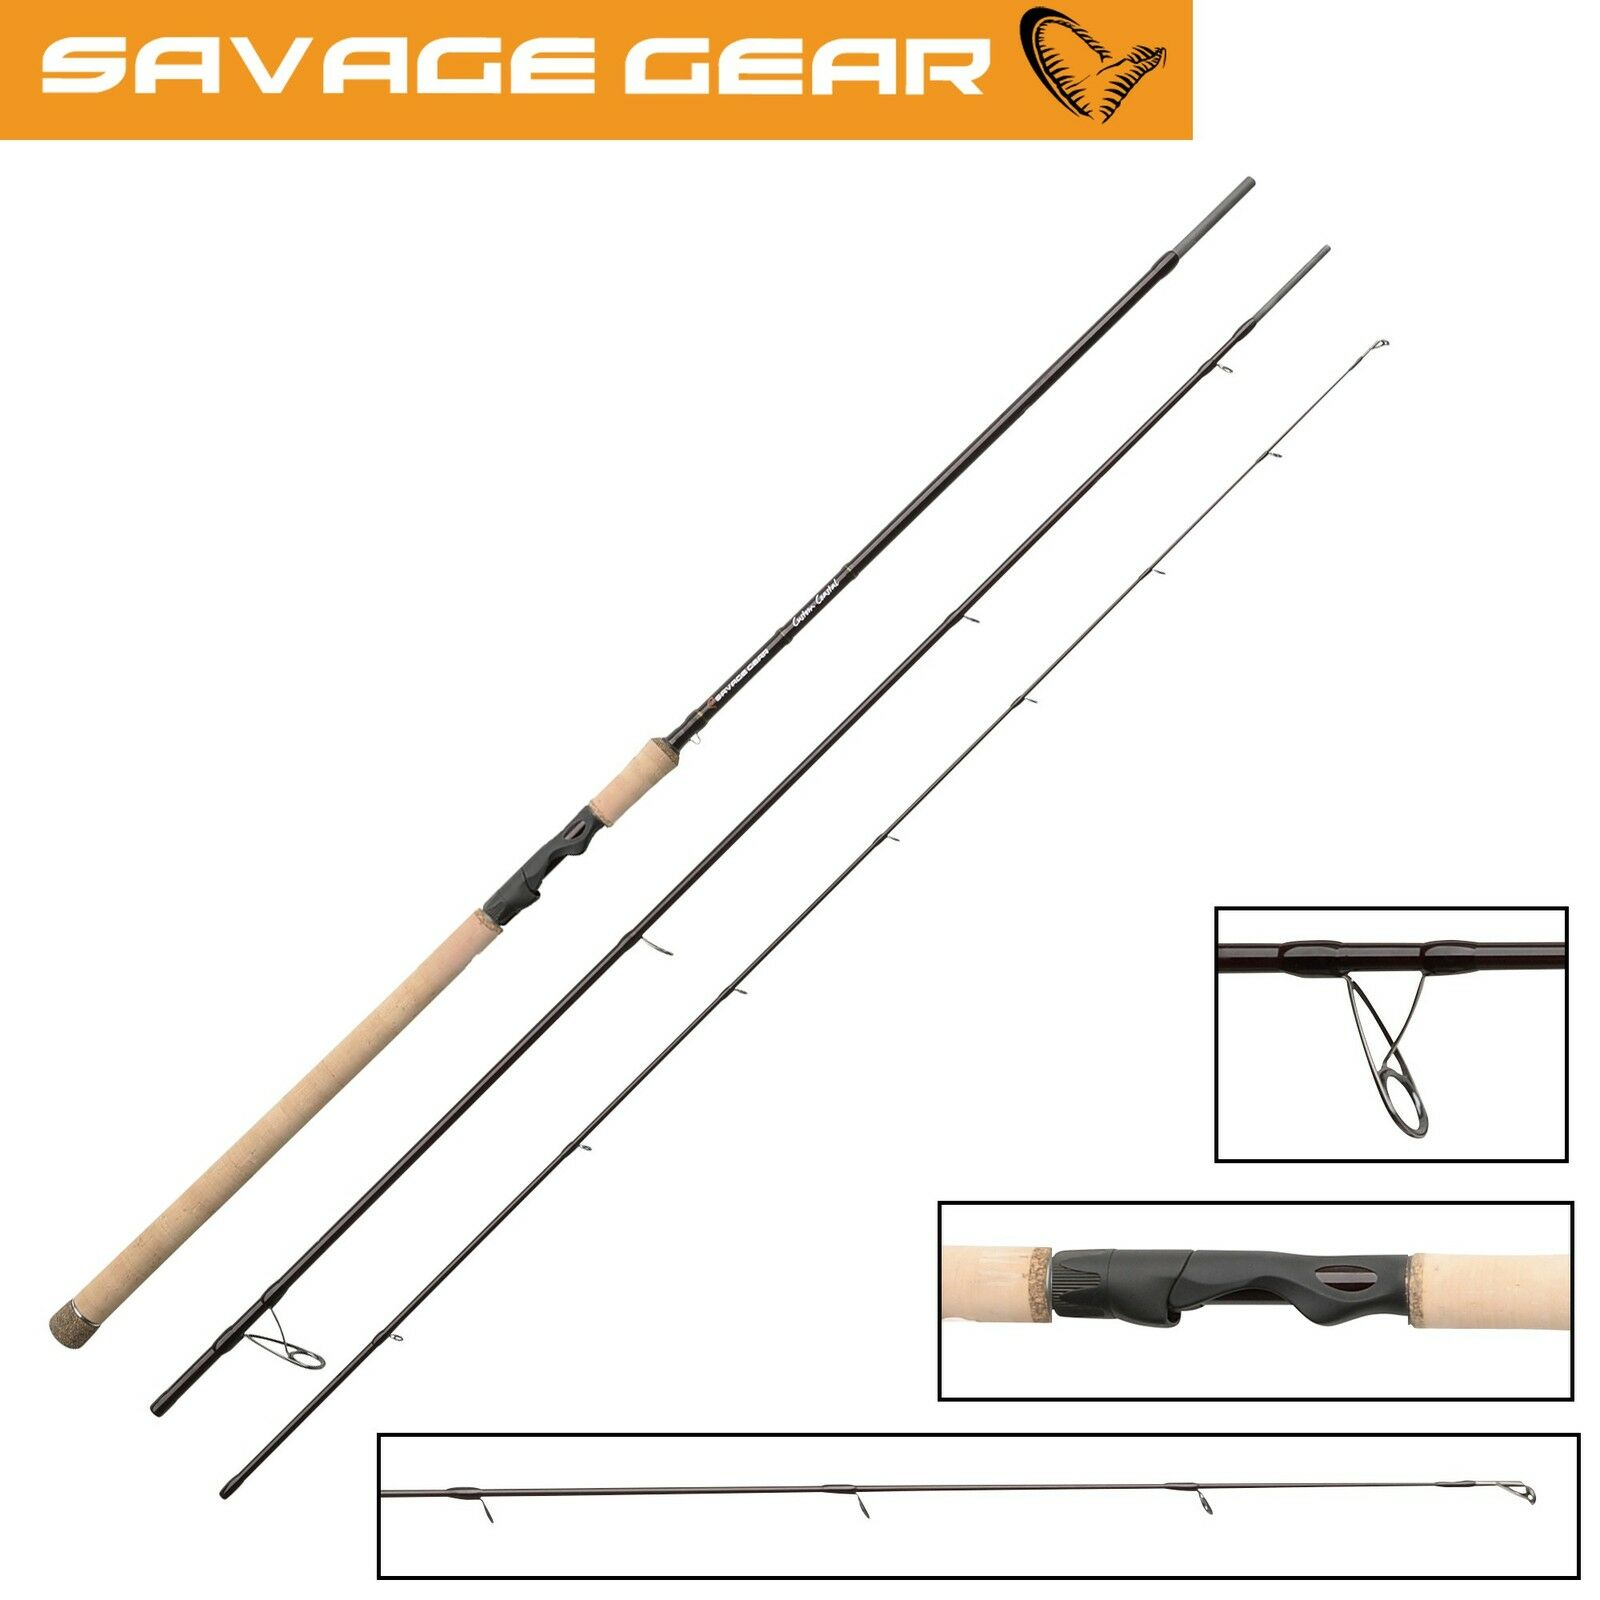 Savage Gear Coastal Custom Coastal Gear Spin 320cm 10-36g, Spinnrute zum Meersangeln 384347